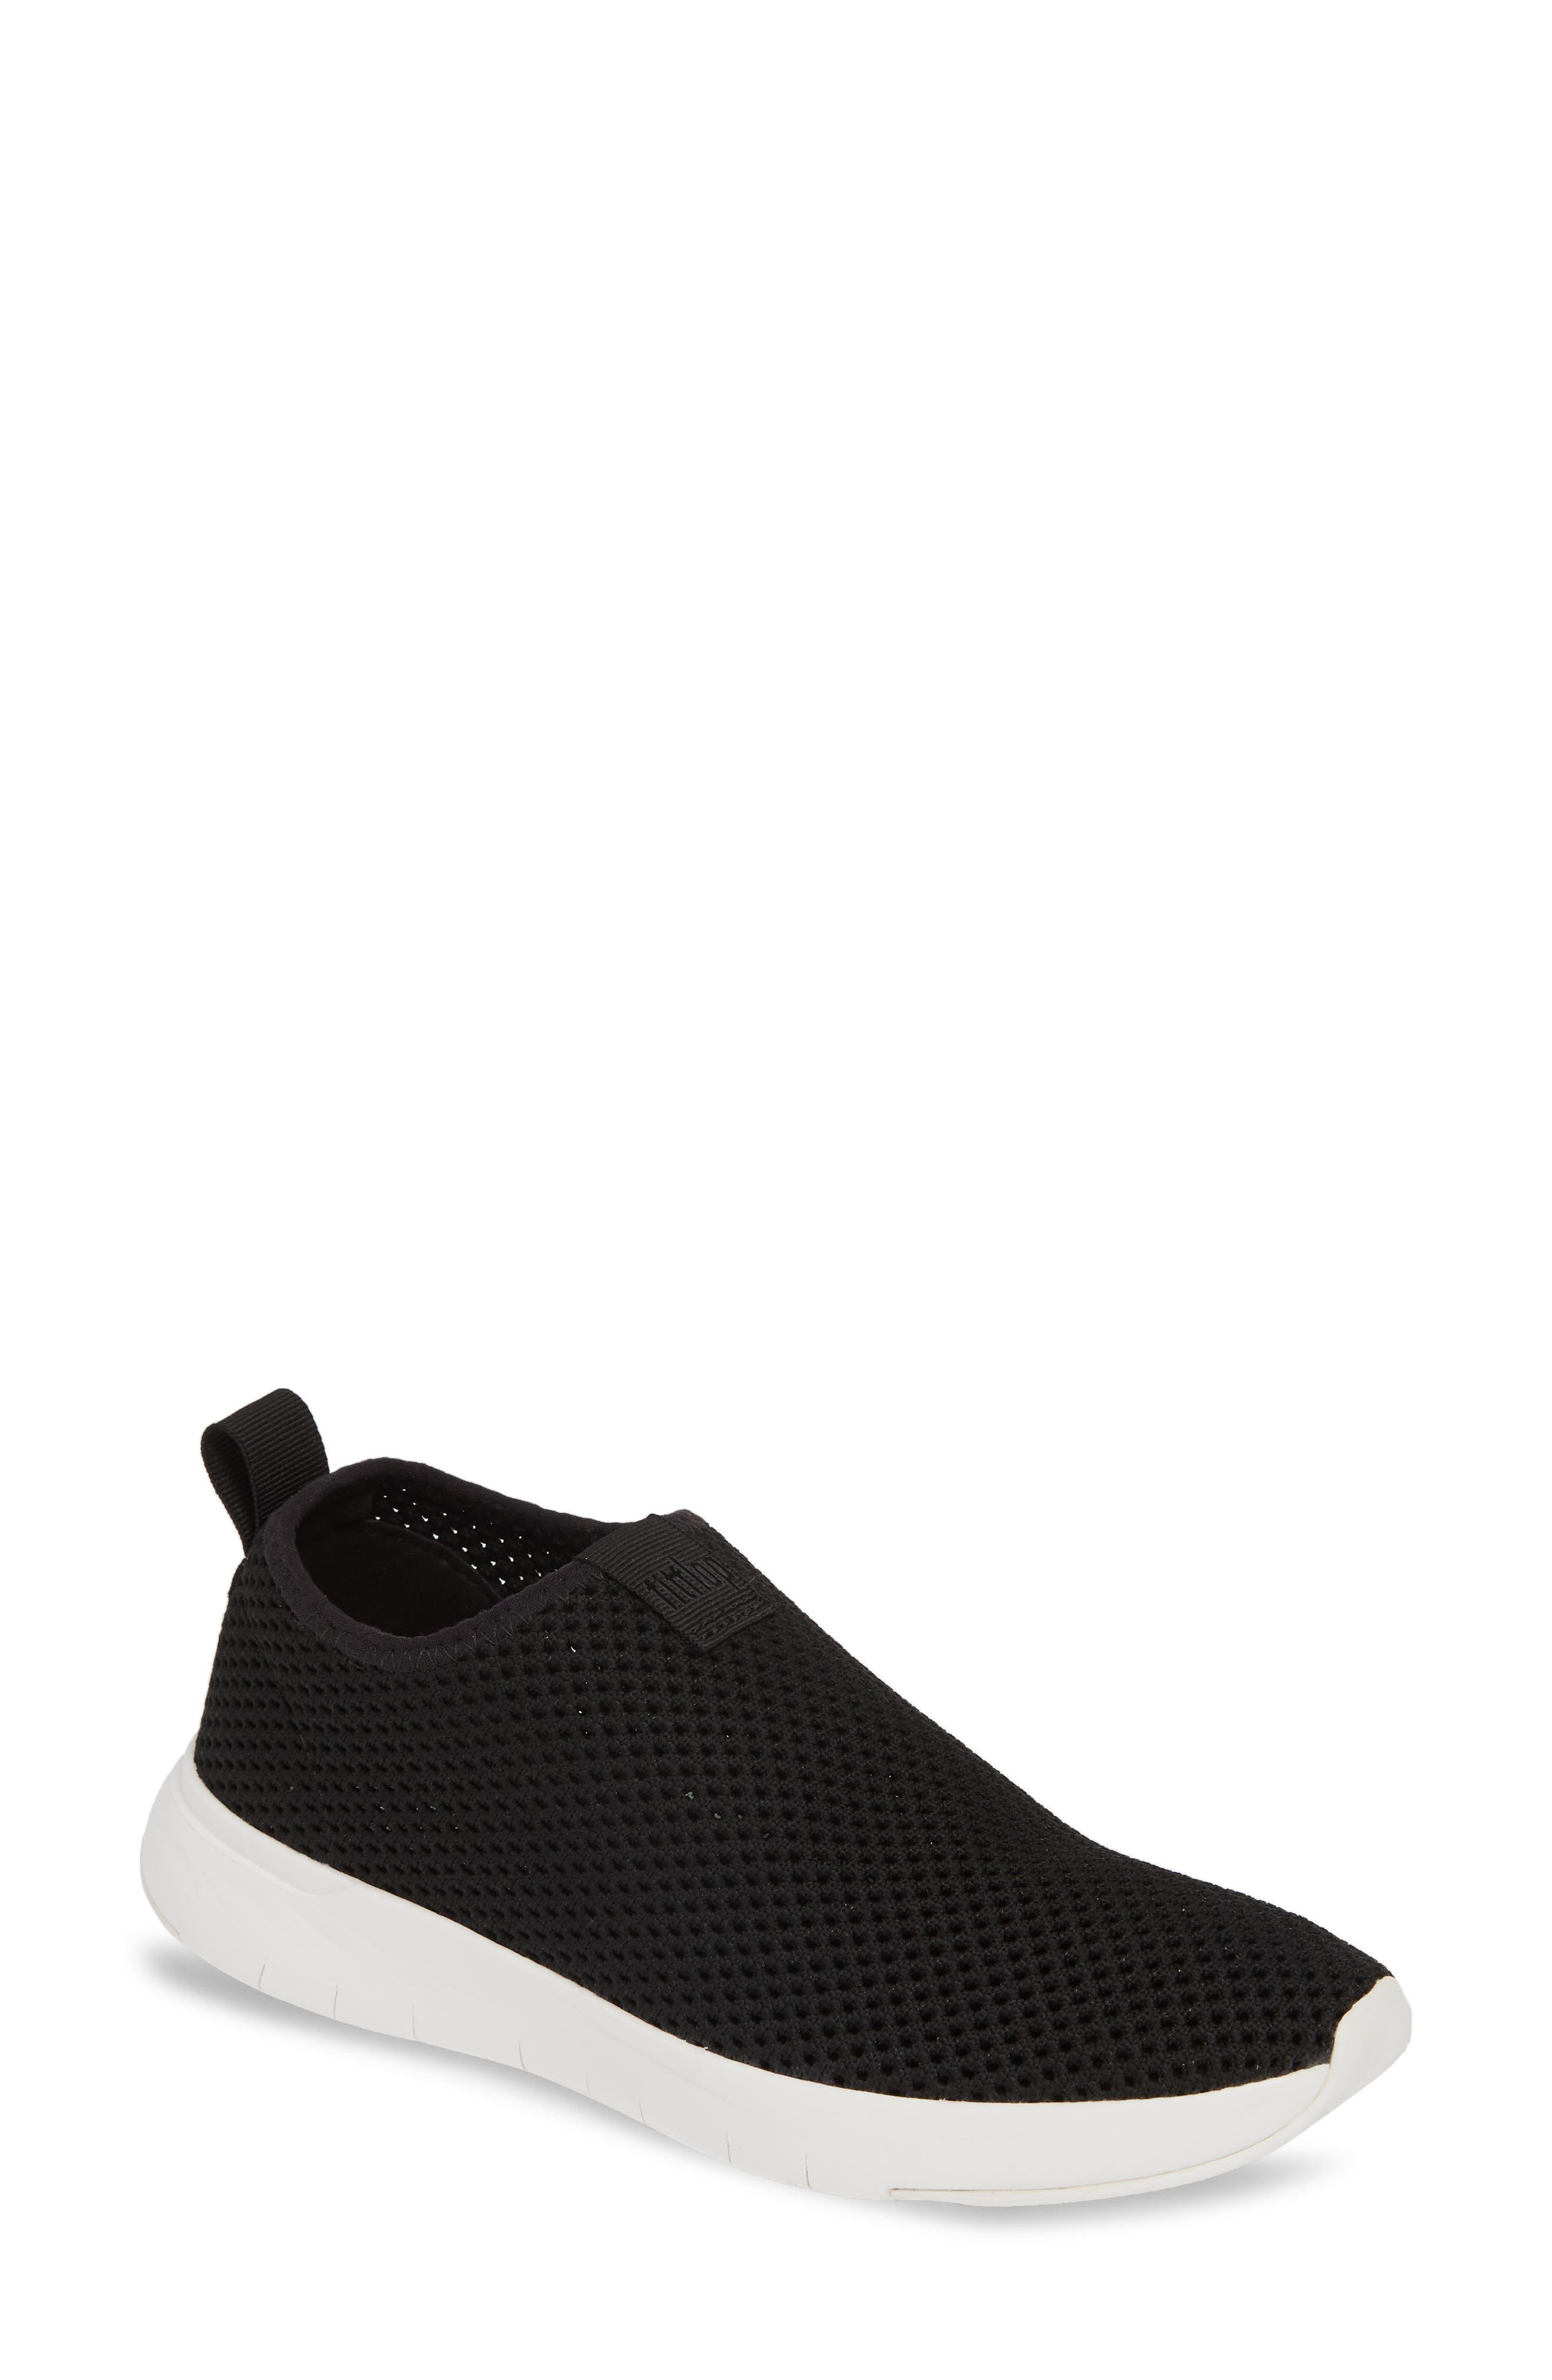 f6ccddce101 Fitflop Airmesh Slip-On Sneaker